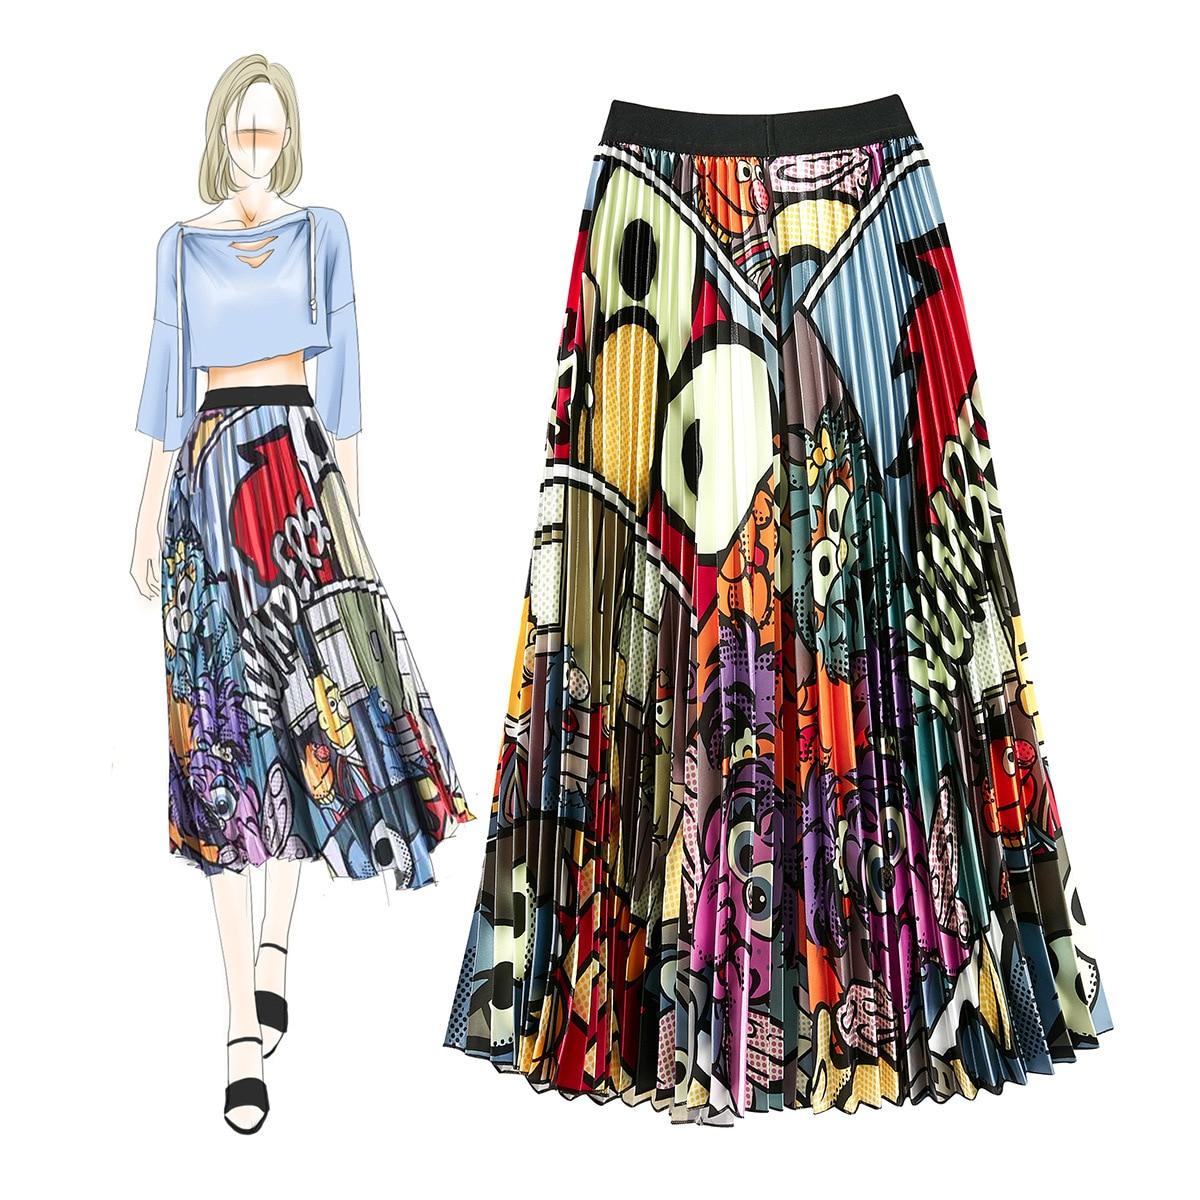 230a522e02 Unique Design Cartoon Pattern Satin Print Fashion Pleated Mid-length Skirt  for Ladies